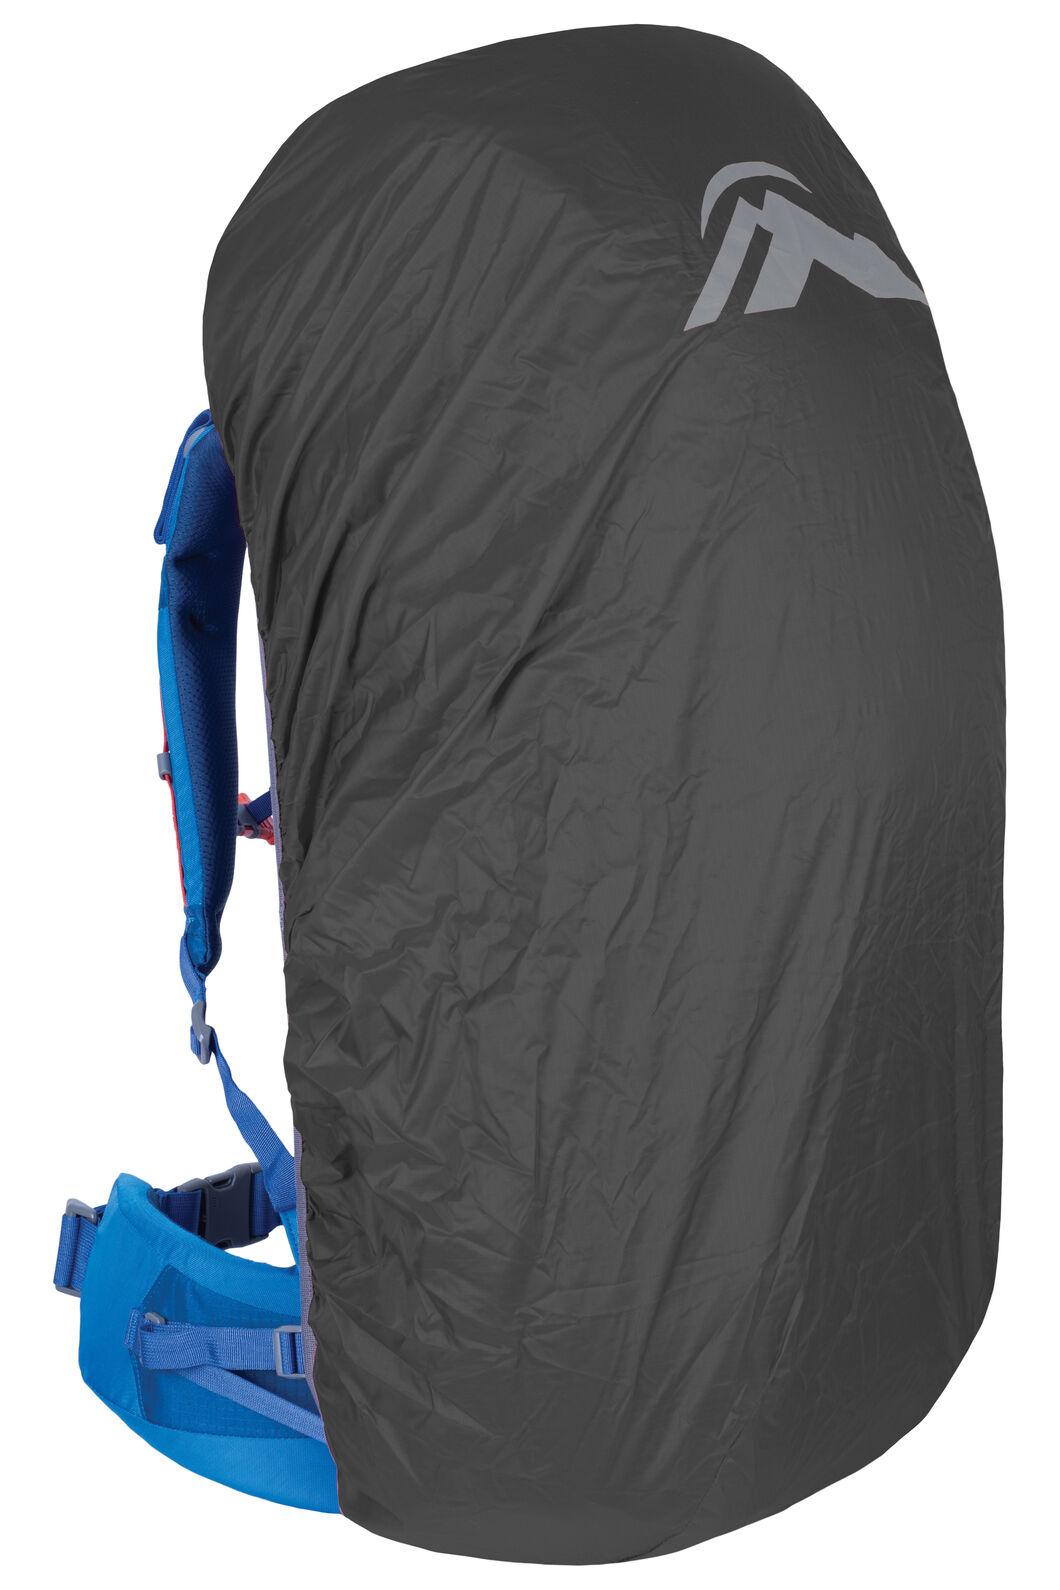 Macpac Pack Raincover XL, Charcoal, hi-res